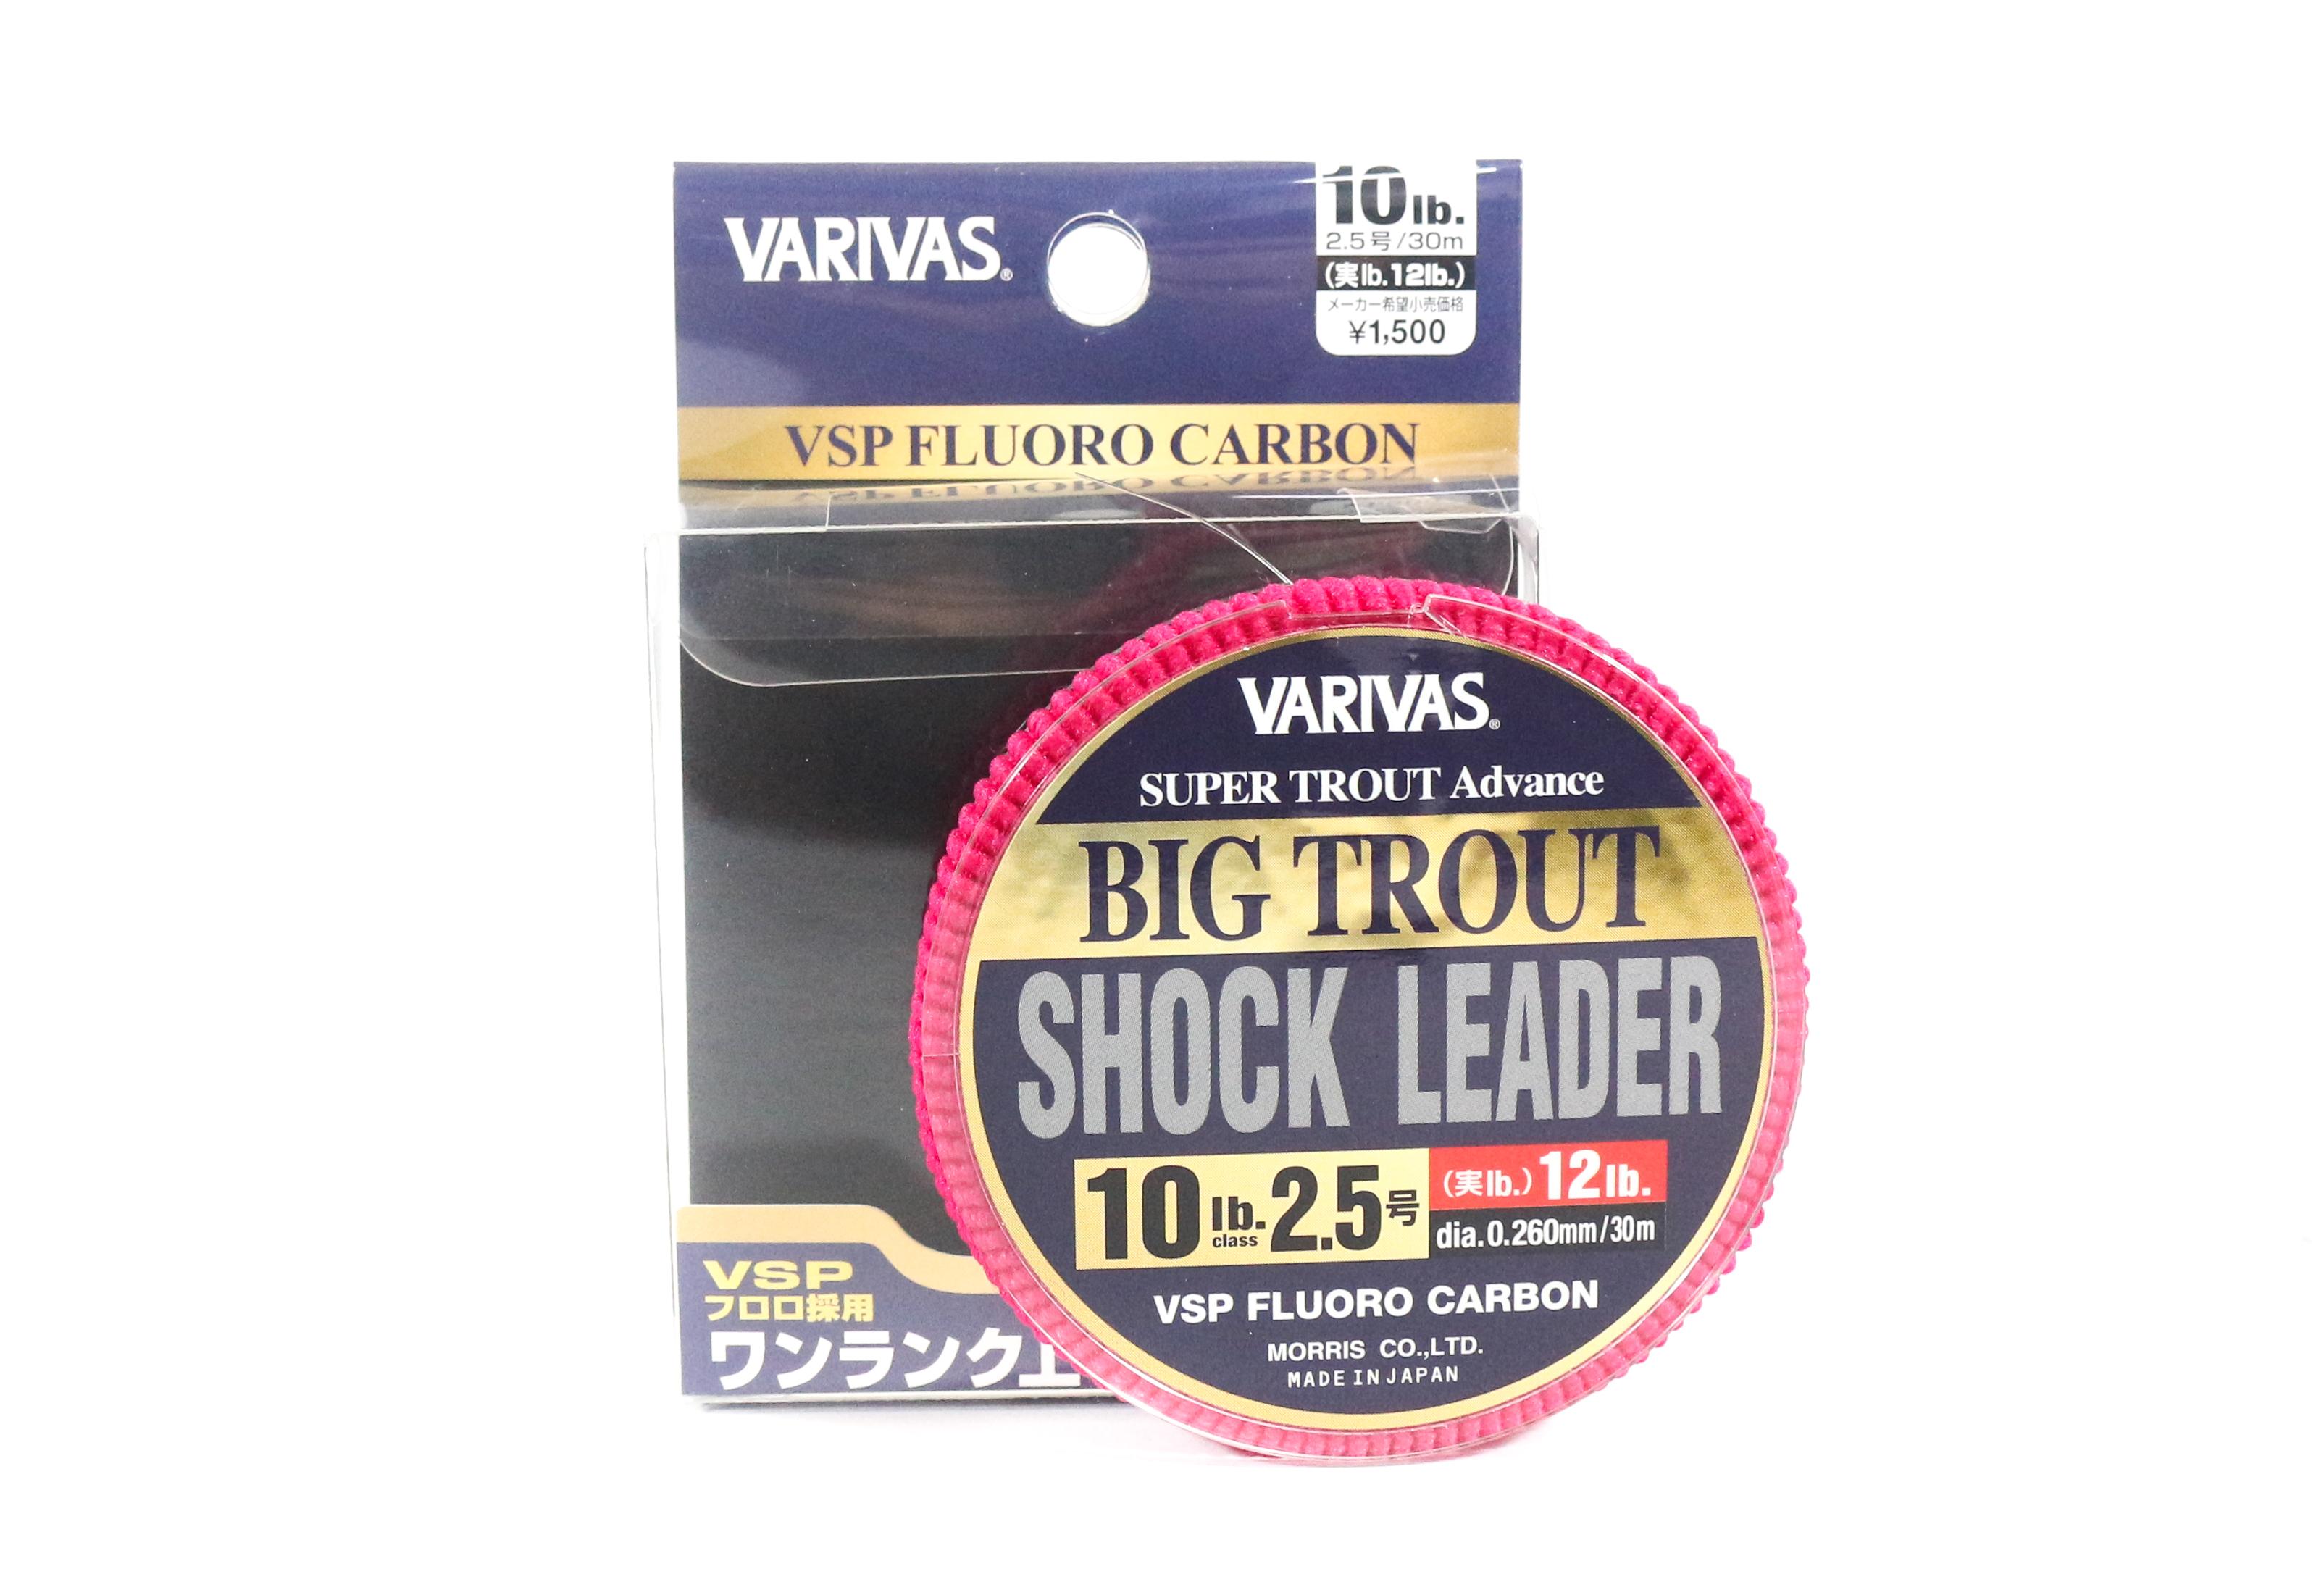 Varivas Fluorocarbon Big Trout Shock Leader Line 30m 10lb (5566)